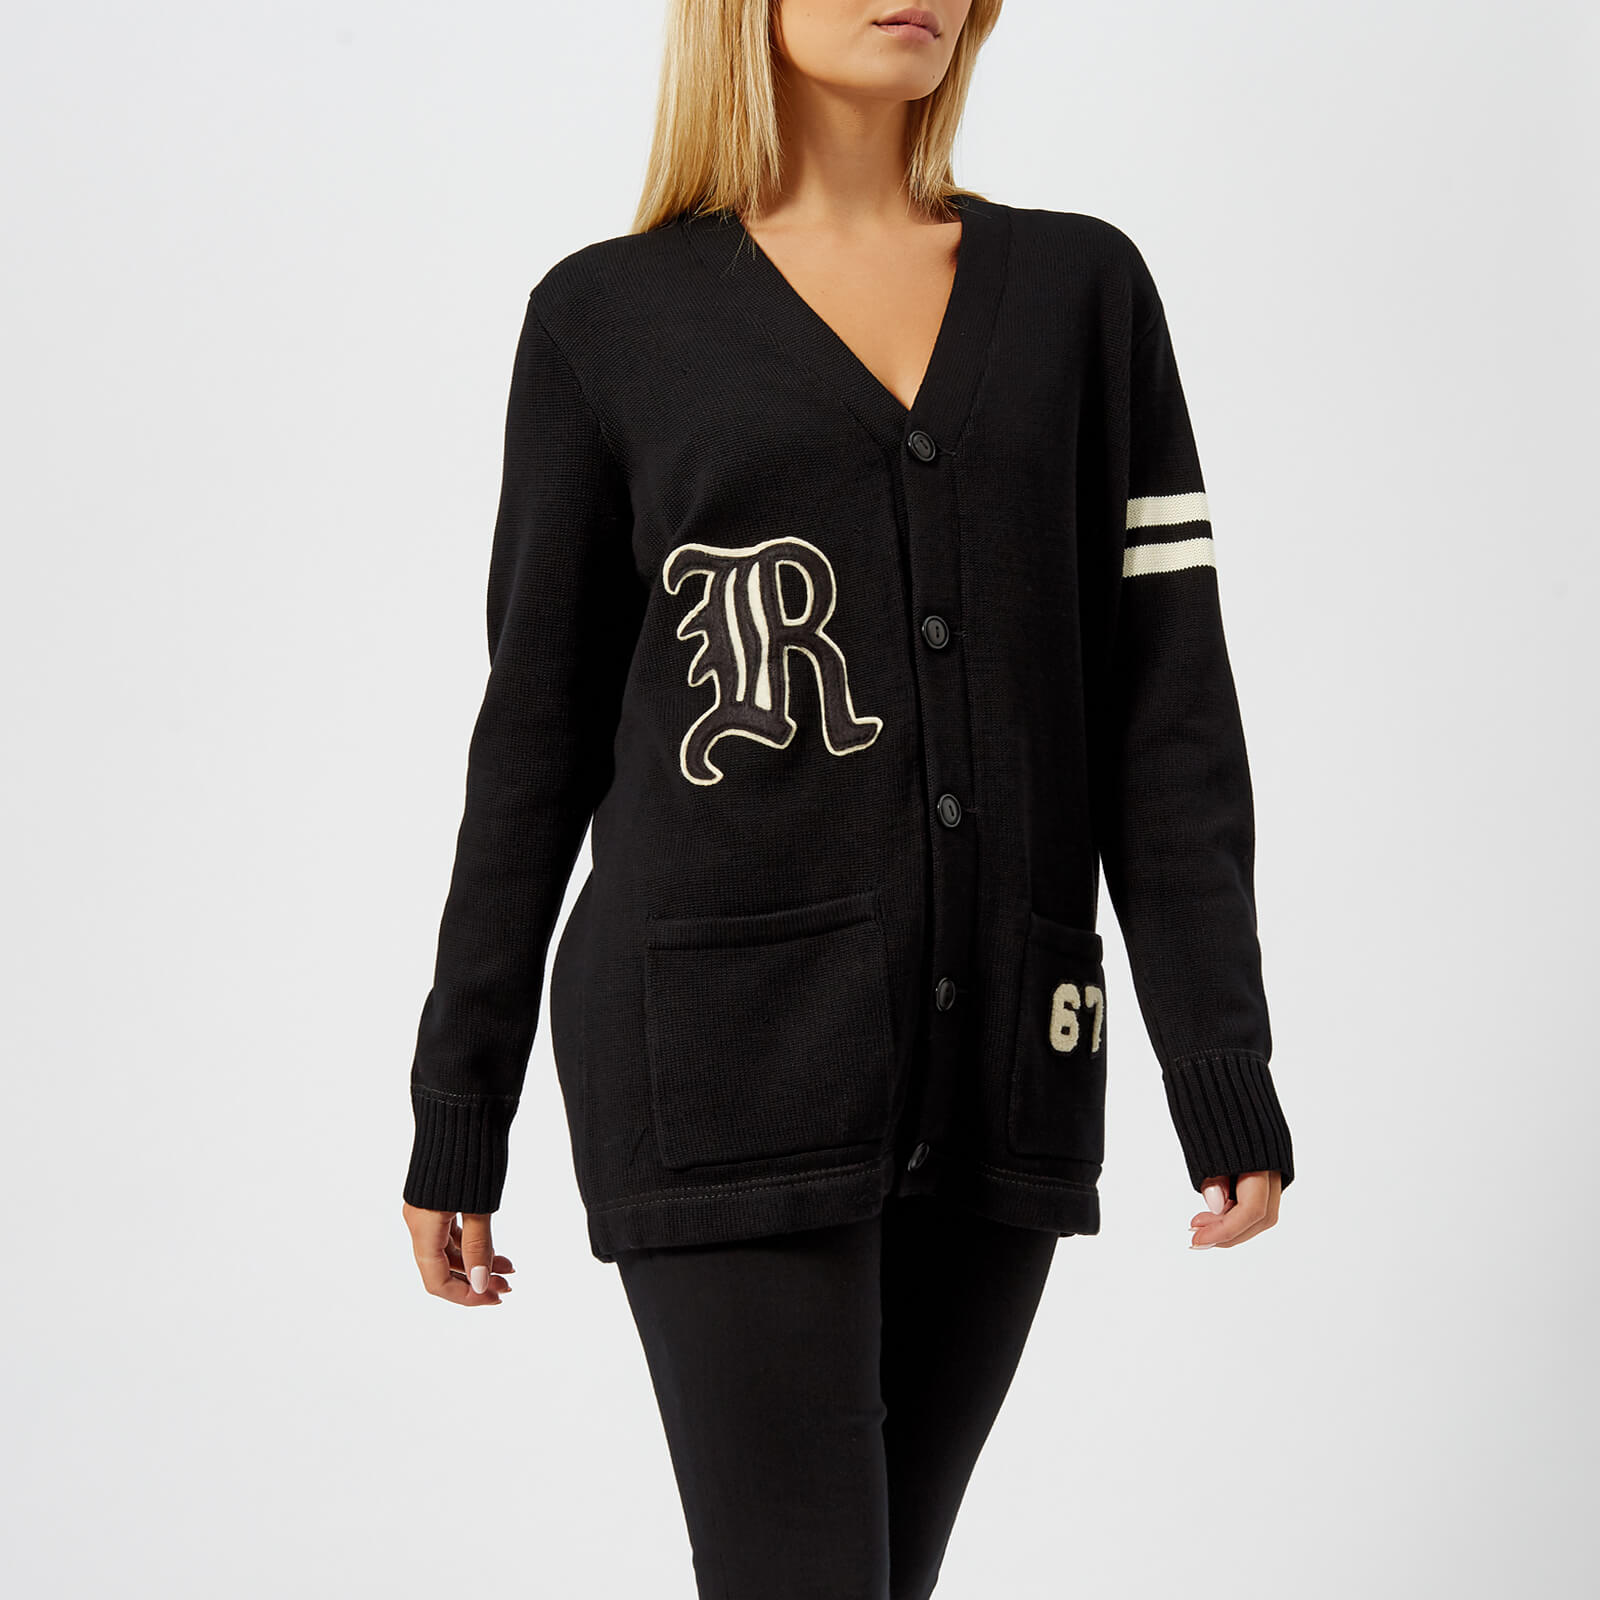 c93bd28e3eb Polo Ralph Lauren Women s Varsity Cardigan - Black Cream - Free UK Delivery  over £50